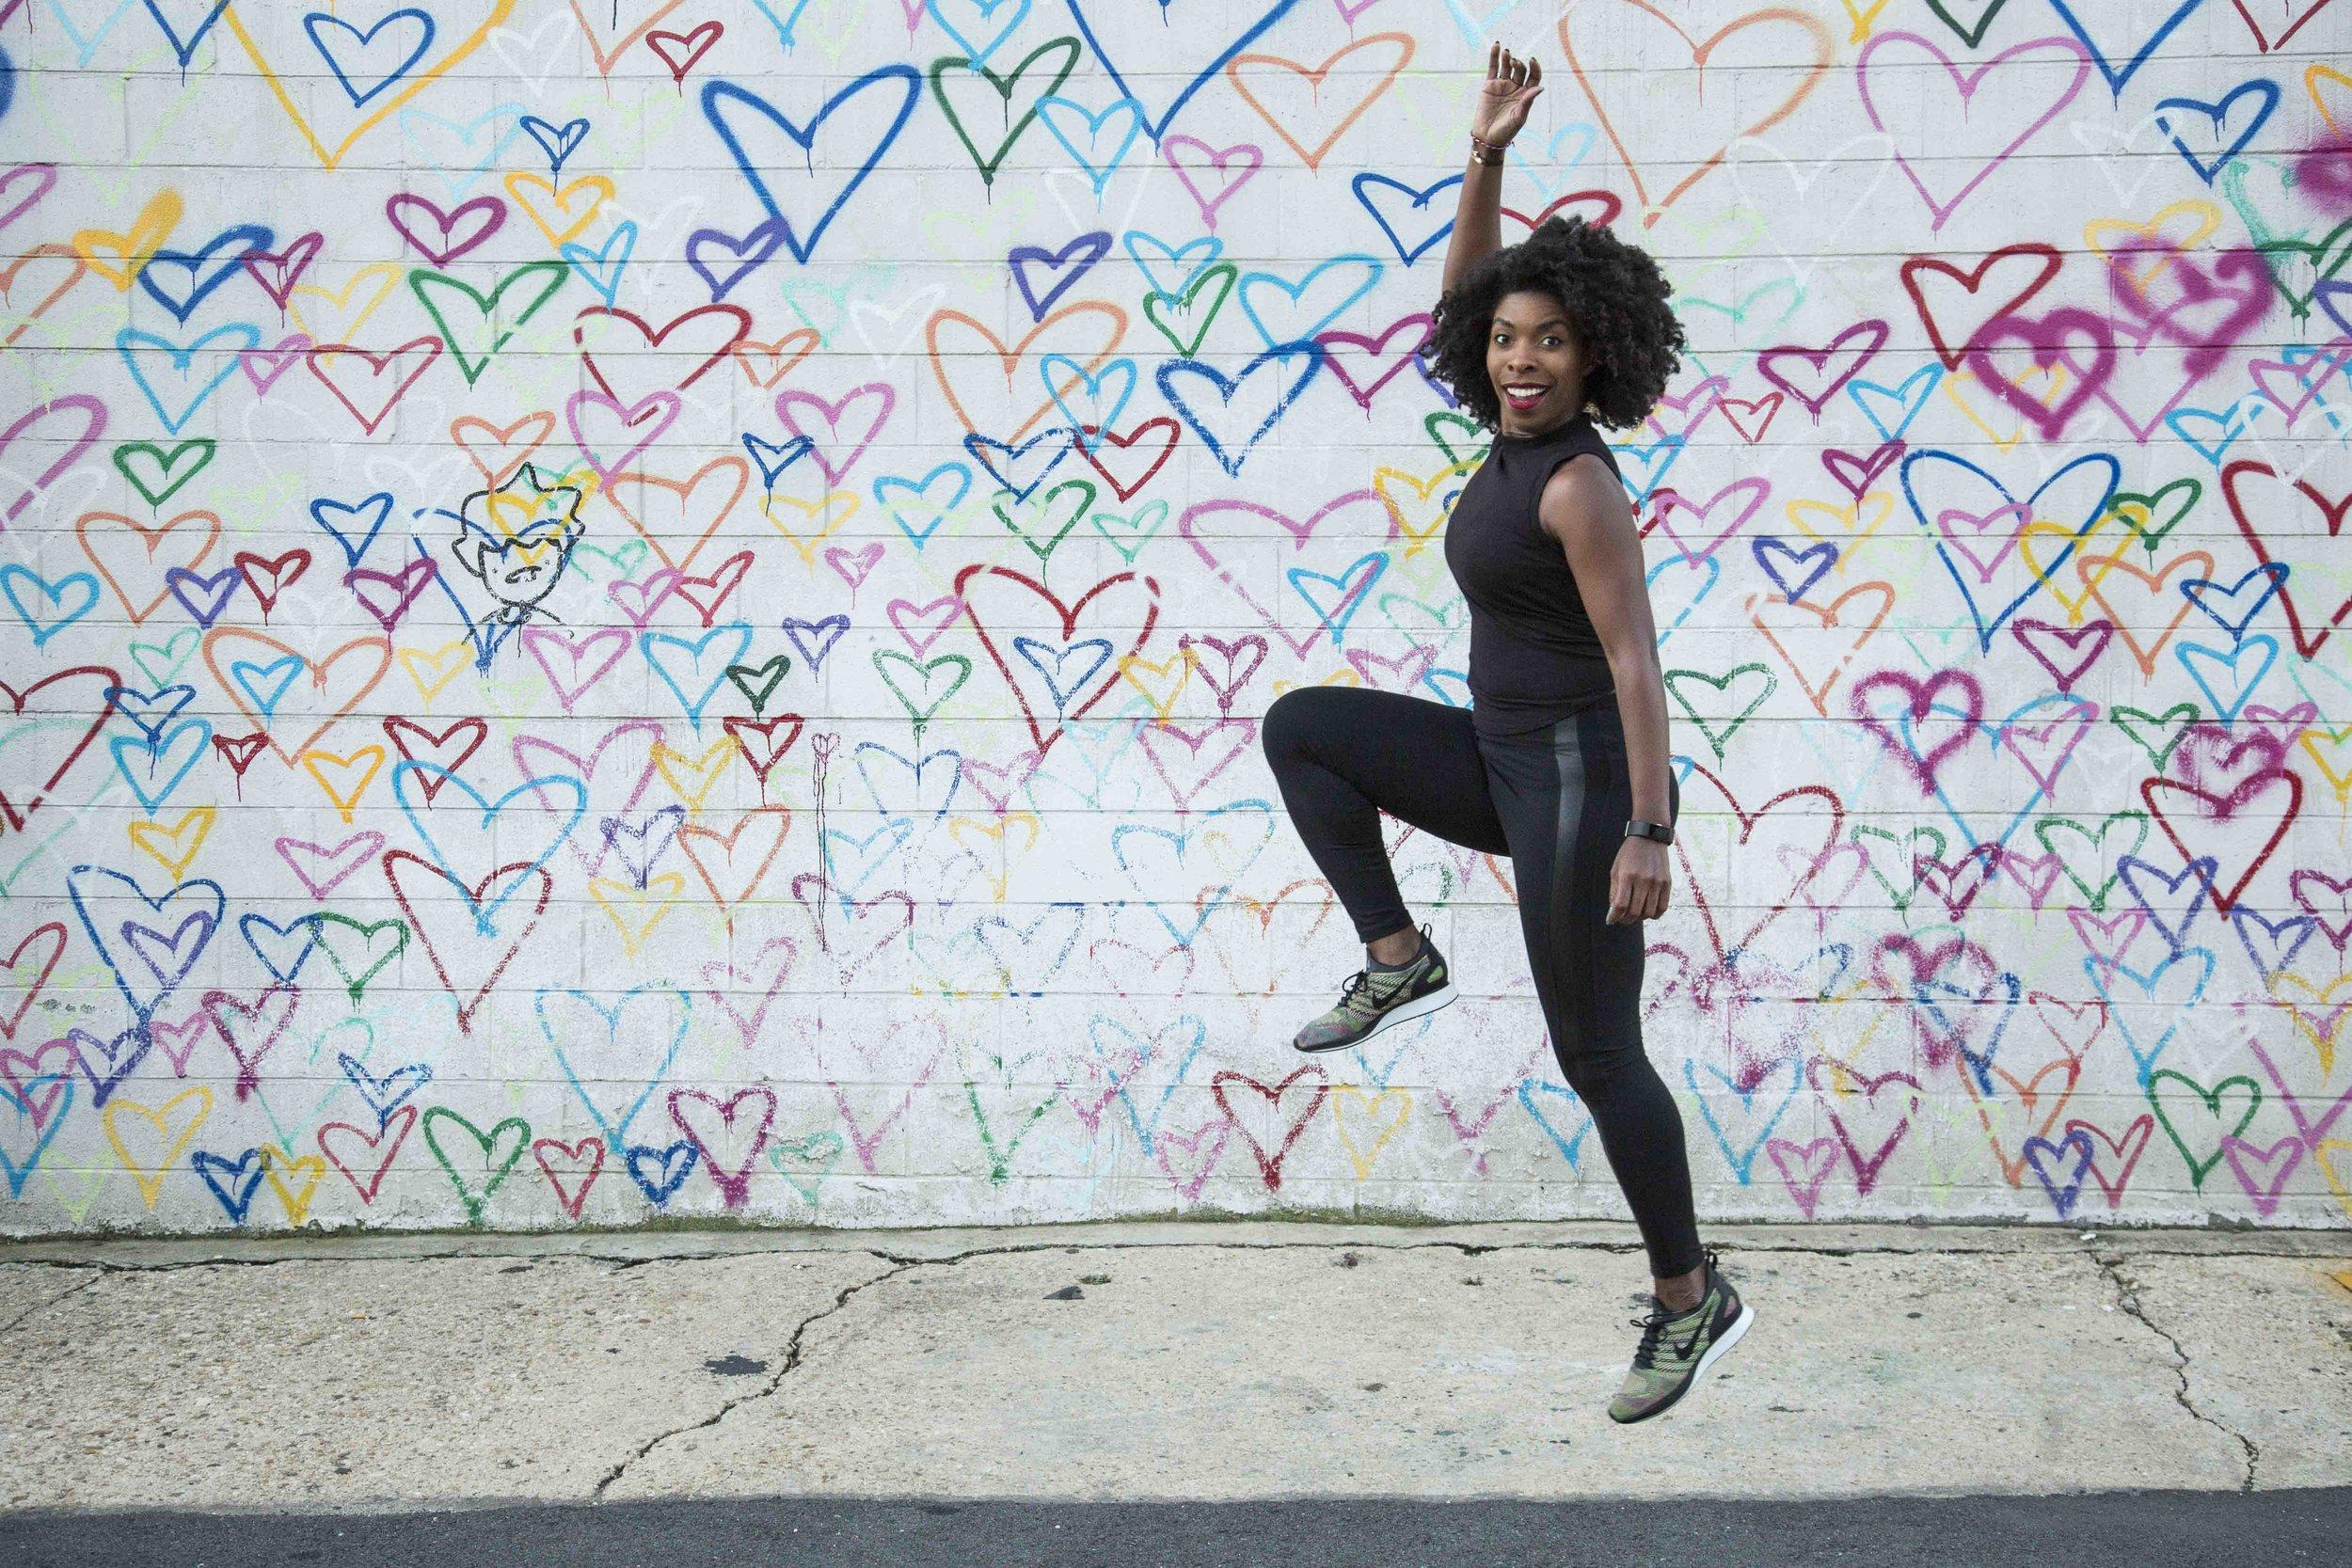 dc-md-va-fitness-professional-yoga-photography-afforadable.jpg